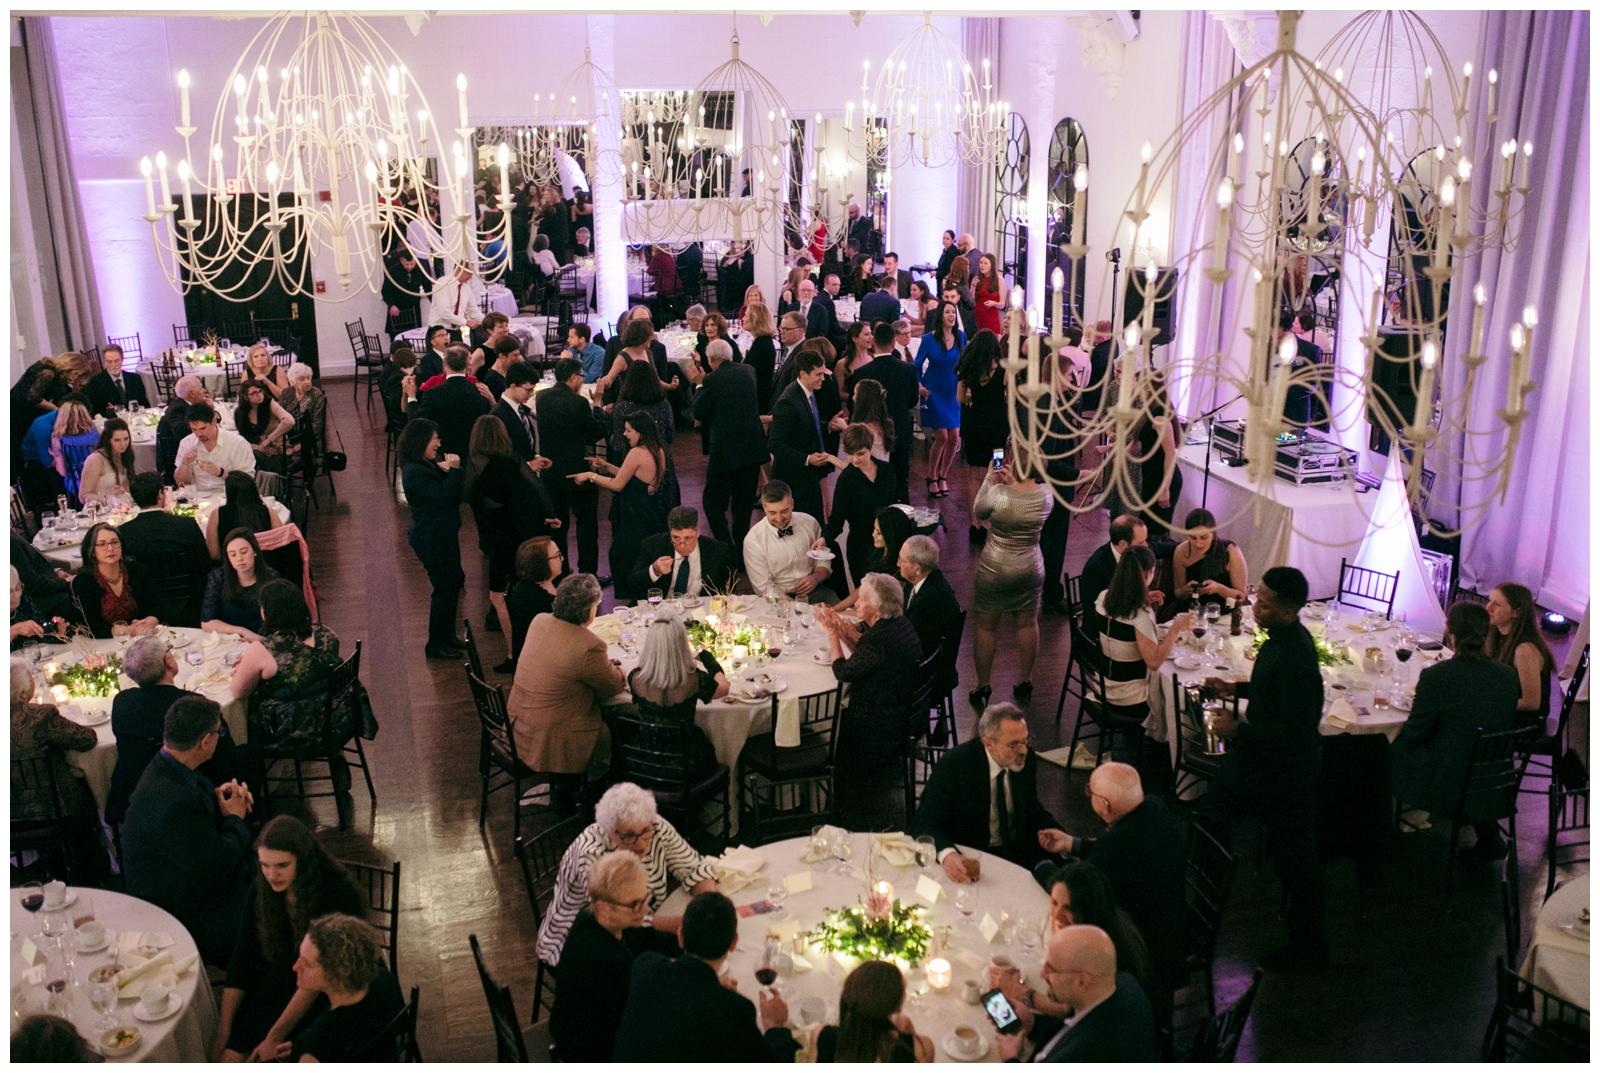 Alden-Castle-Wedding-Boston-Bailey-Q-Photo-074.jpg